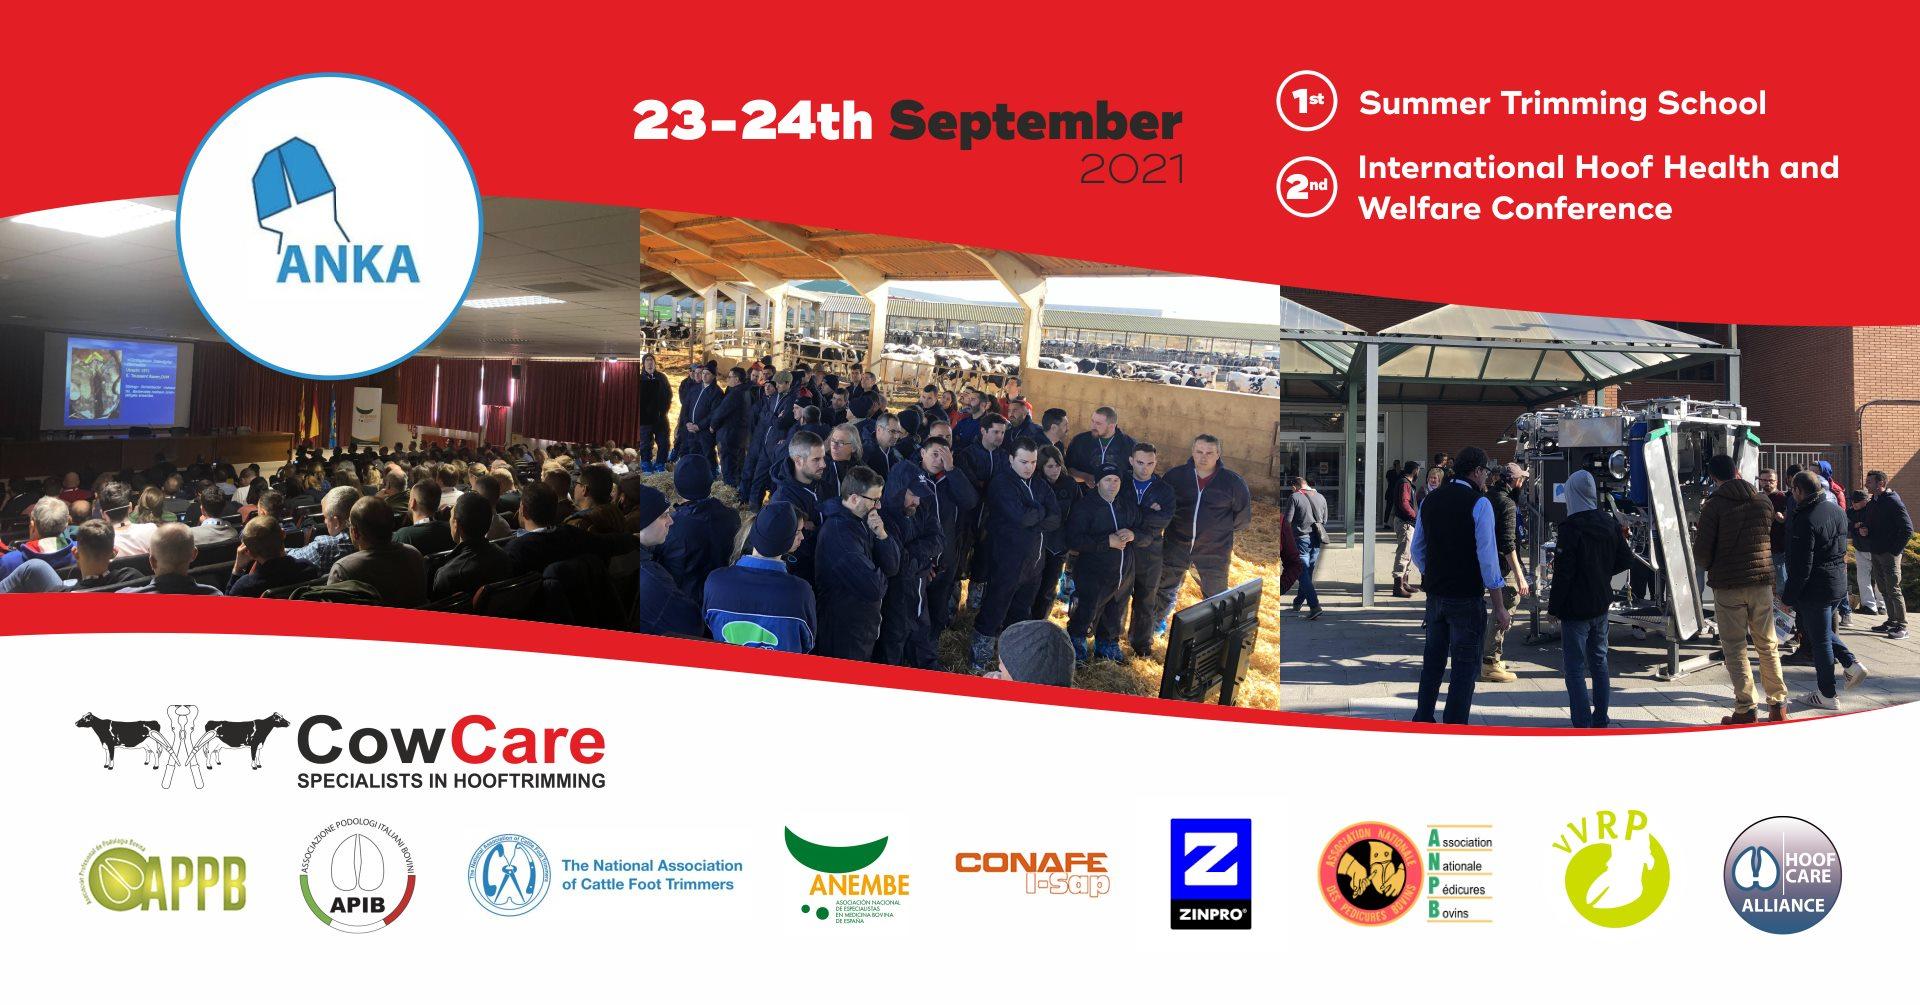 Summer-Trimming-School-2021-002-ANKA-CowCare